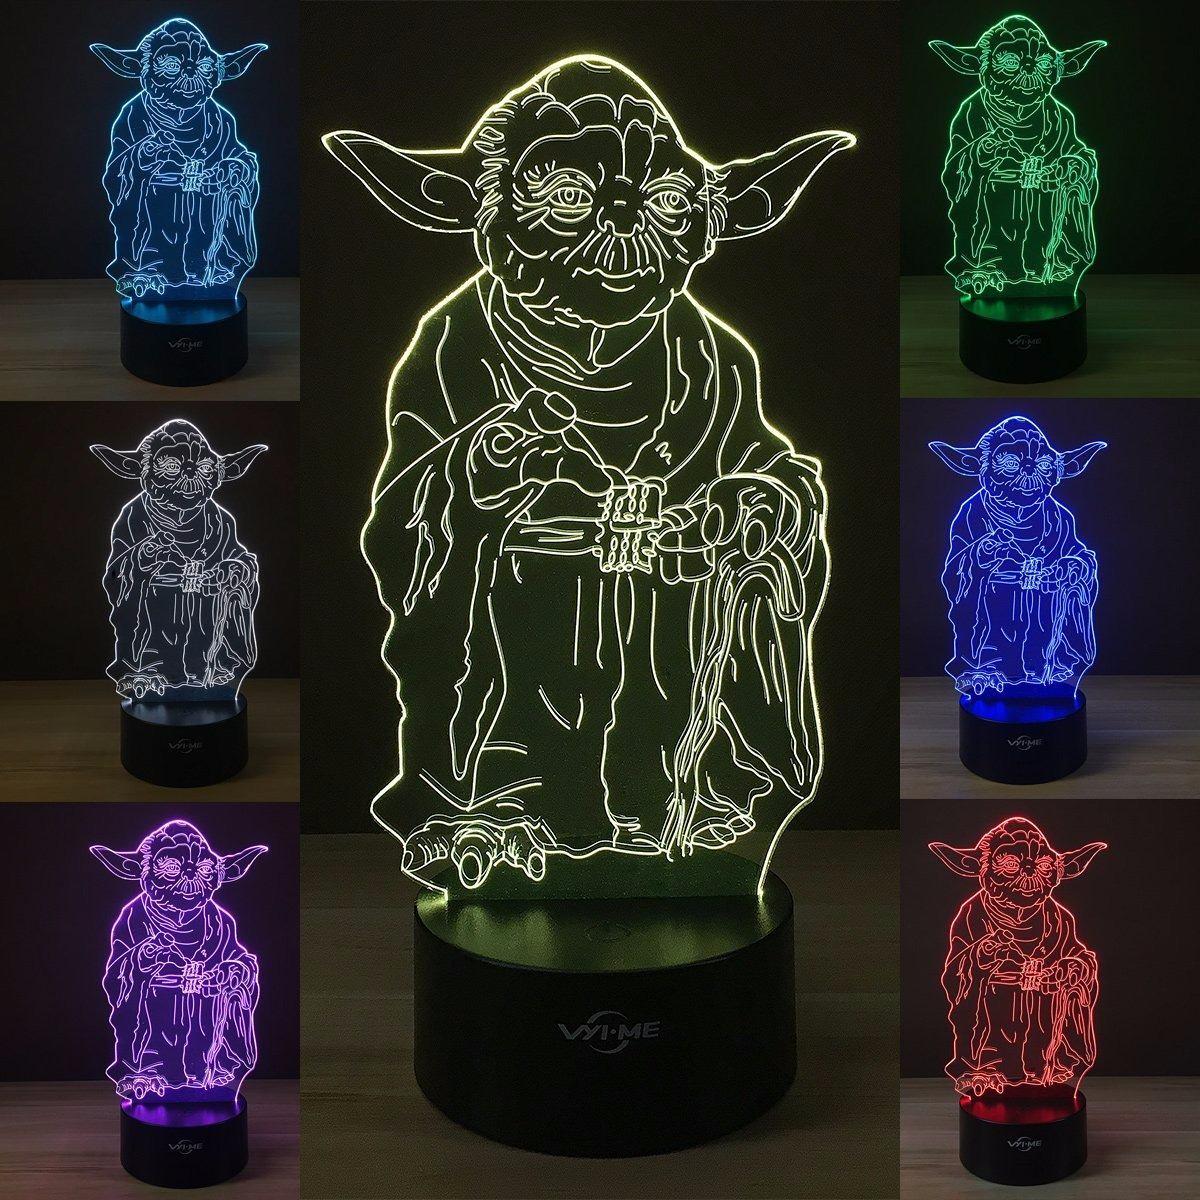 Led Wars Mesa Star Dd Holograma Lampara 3d Yoda 140 Ilusion 0wO8nPNkX